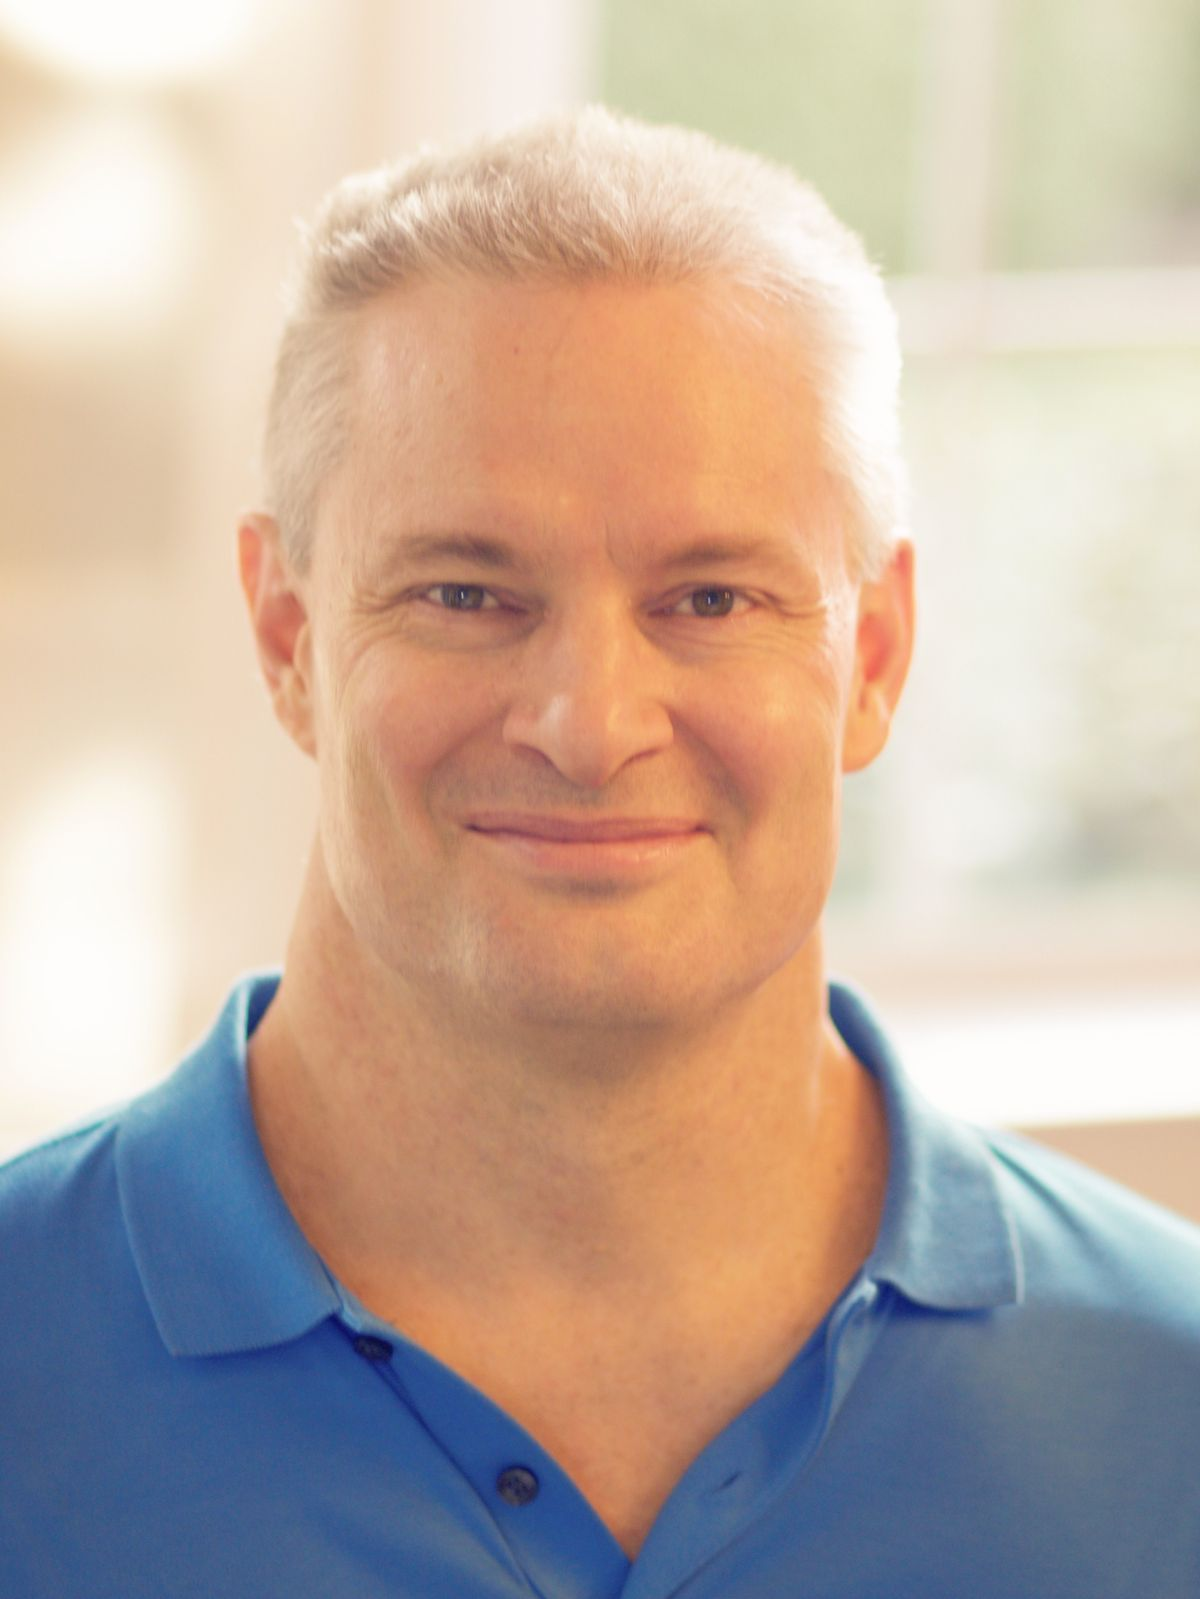 DailyPay Adds David Dyar as Senior Vice President of Engineering, DailyPay